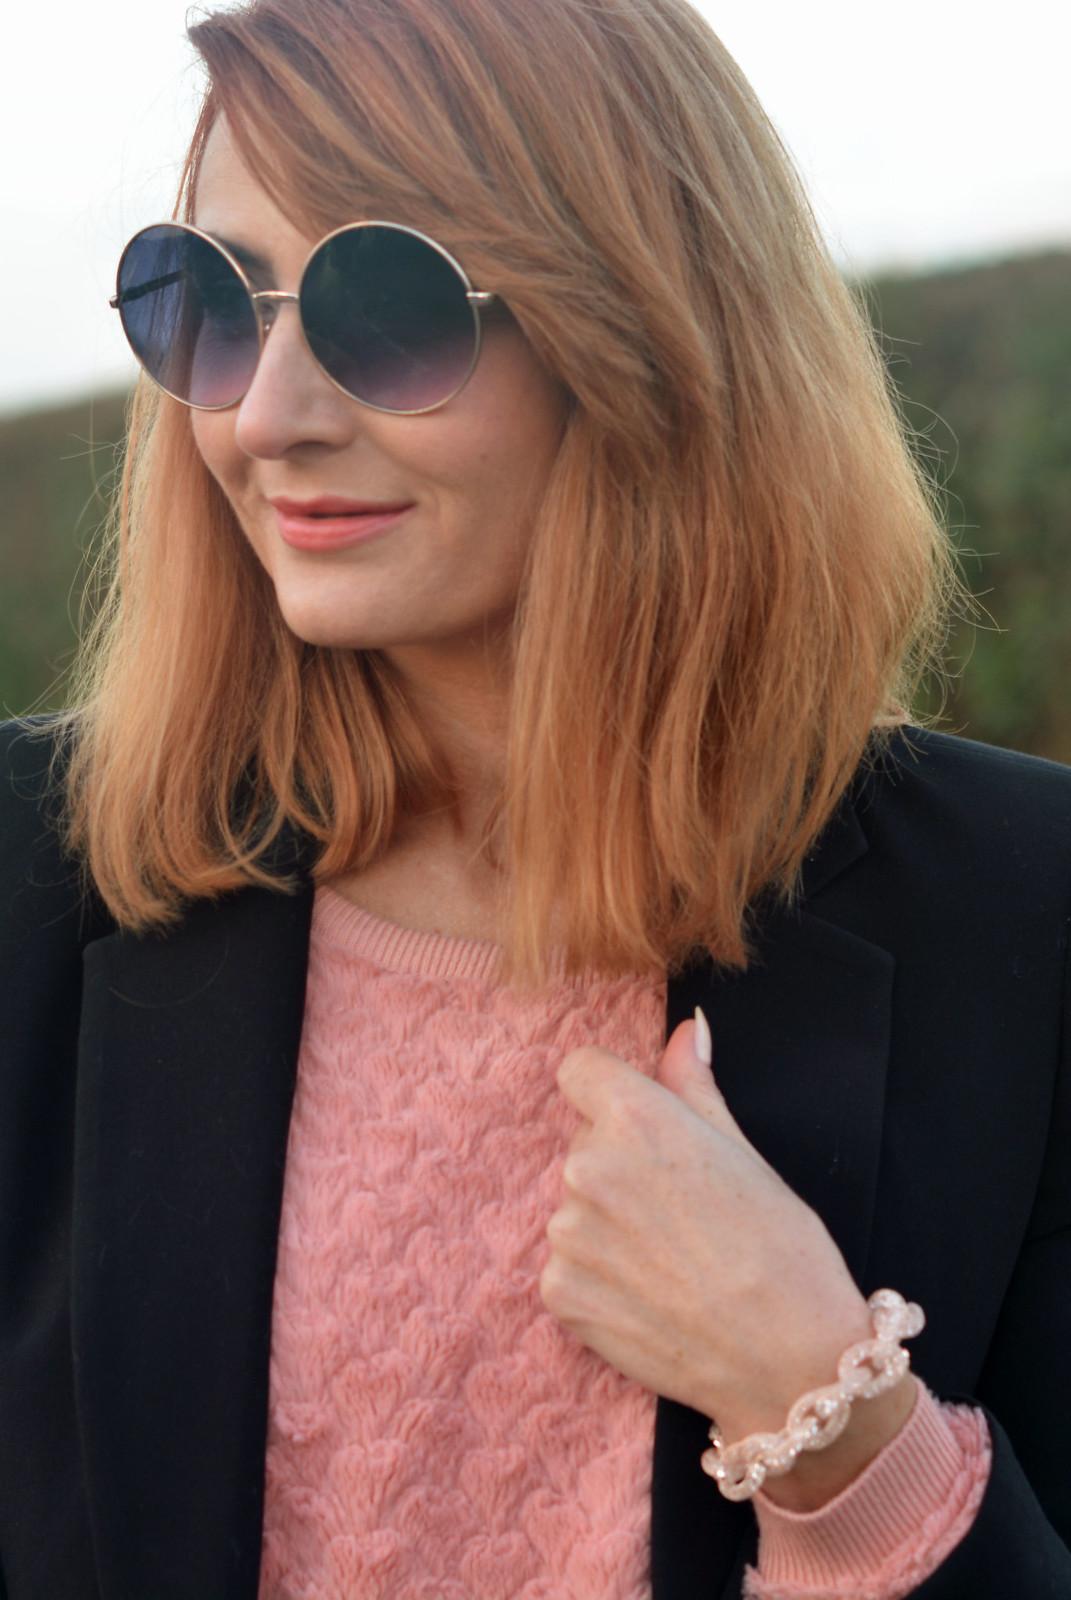 Black blazer, pink sweater, sparkly link bracelet